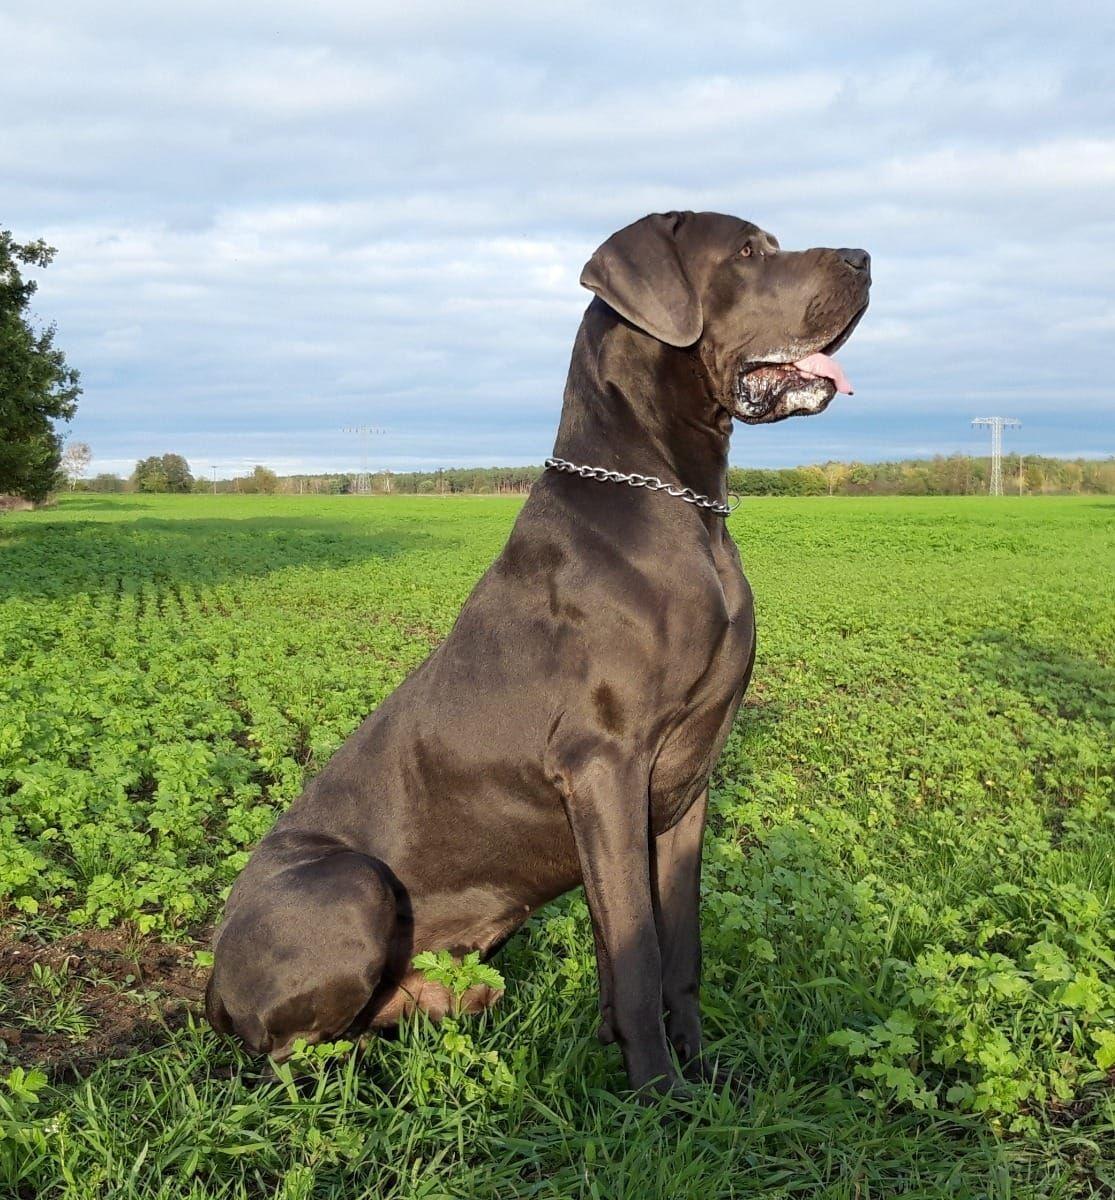 Deutsche Doggen Deckrude Zahna Elster Deutsche Dogge Deckrude Deine Tierwelt De In 2020 Deutsche Doggen Deutsche Dogge Gesunde Hunde